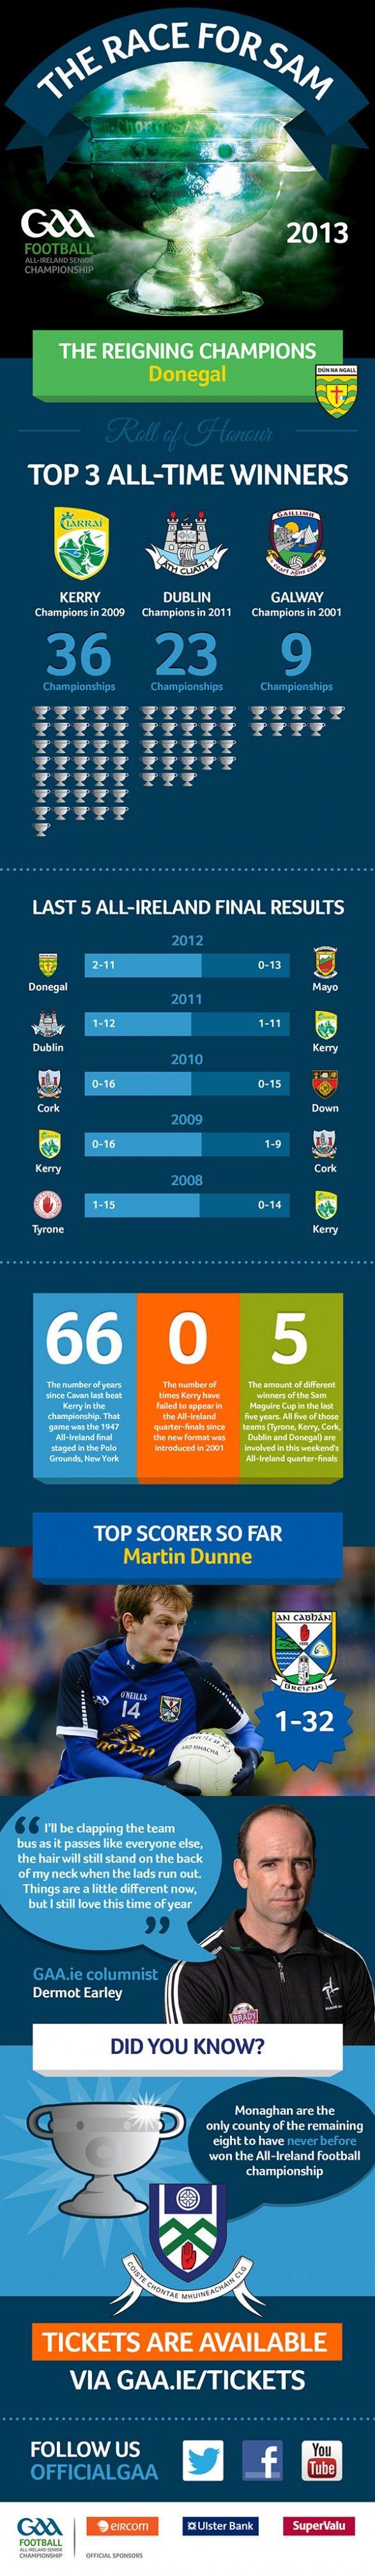 GAA 2013 The Race for Sam #gaa